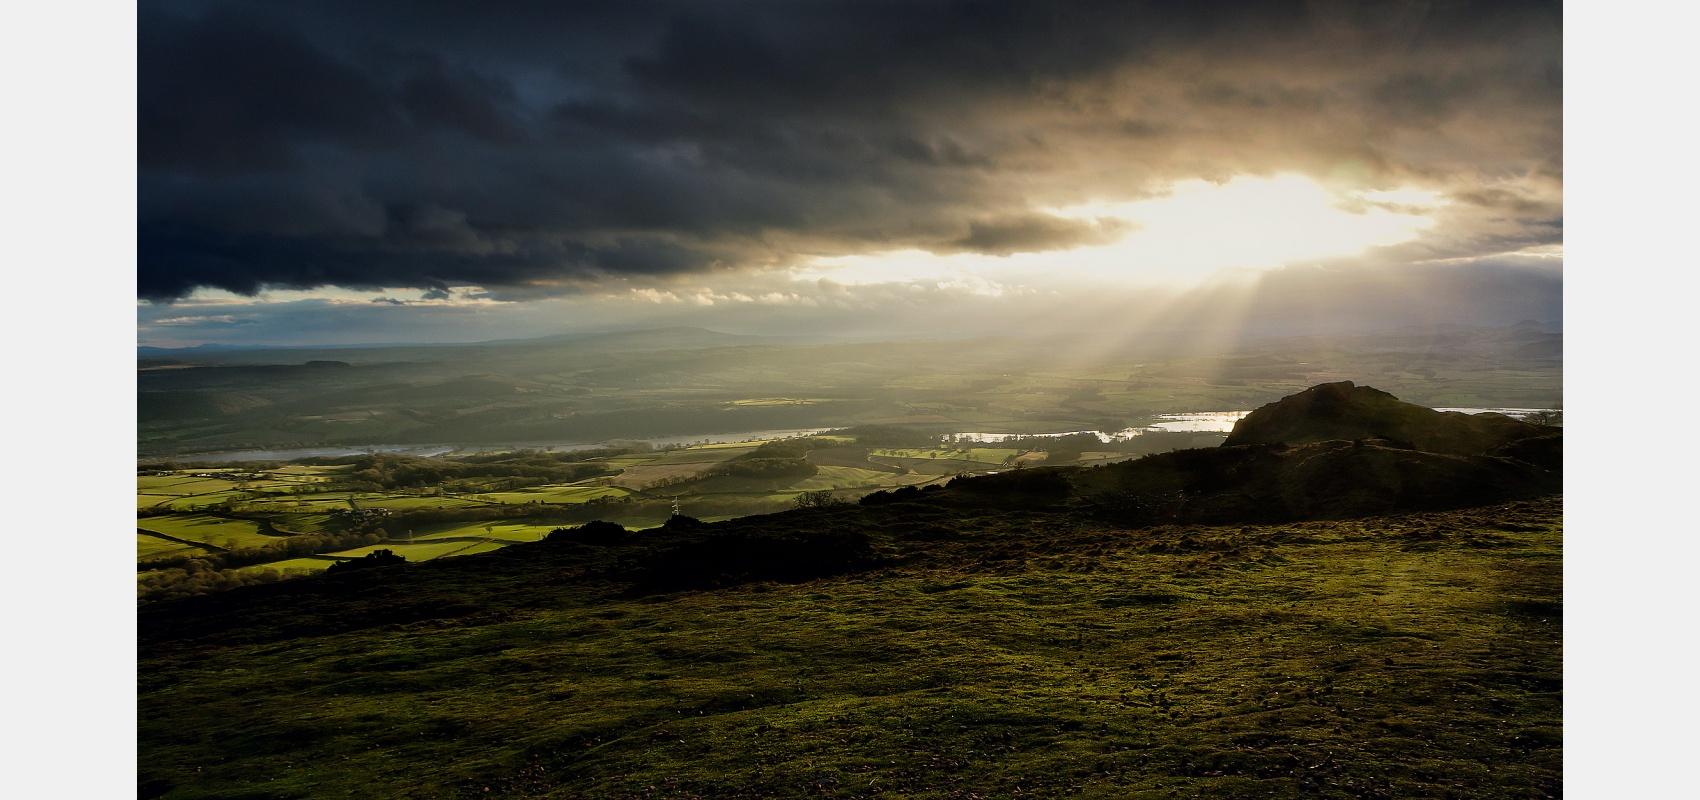 Location, landscape, Sunlight, flooded, River, Severn, Shropshire, hills